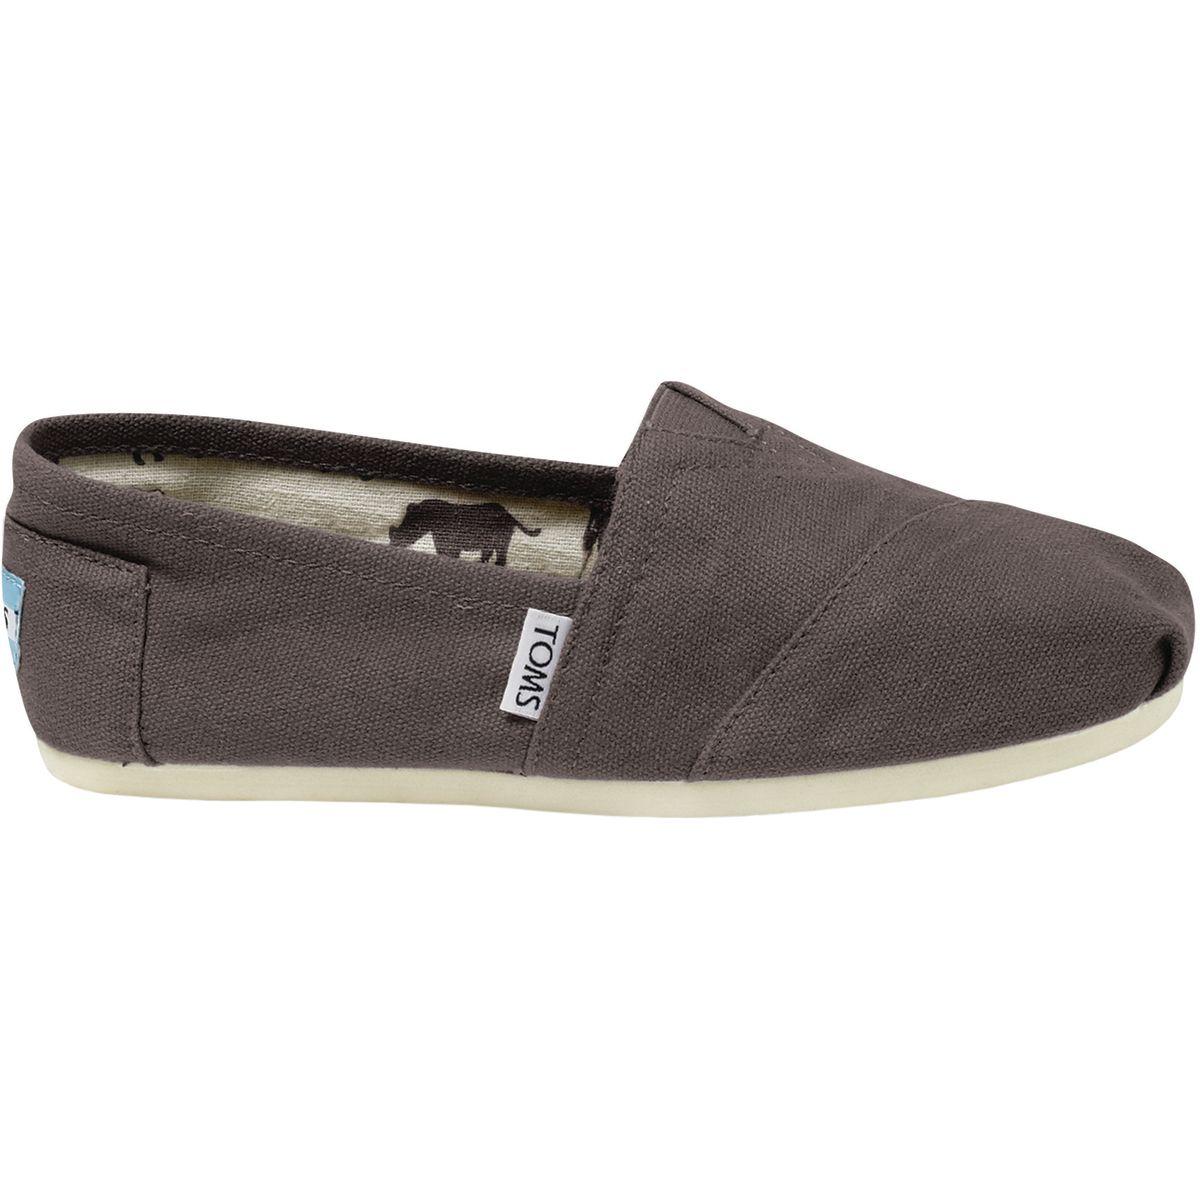 5a04fc875b0288 Toms-Alpargata-Canvas-Shoe-Women-039-s thumbnail 5